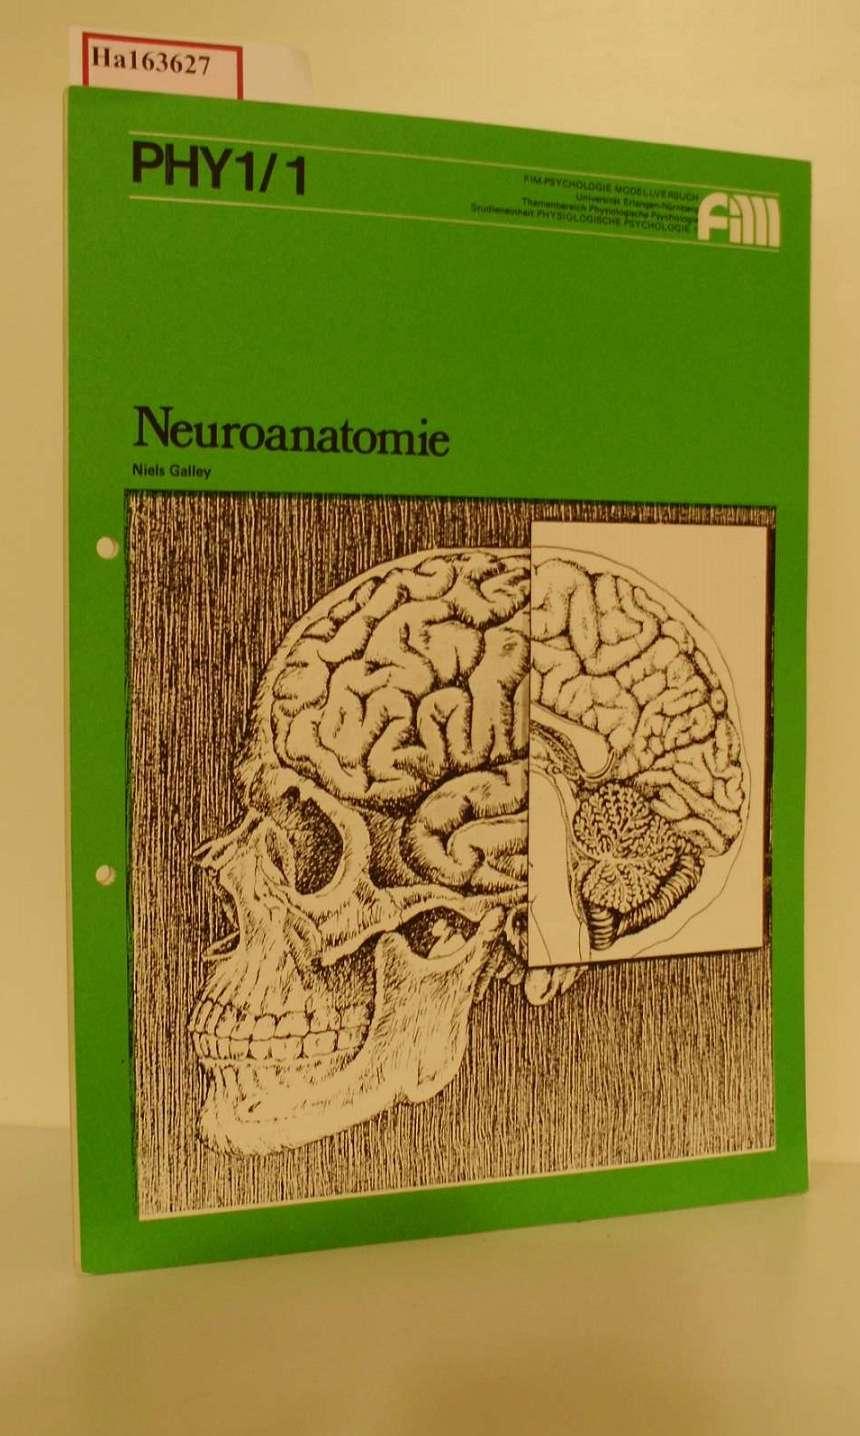 Neuroanatomie. (PHY 1/1).